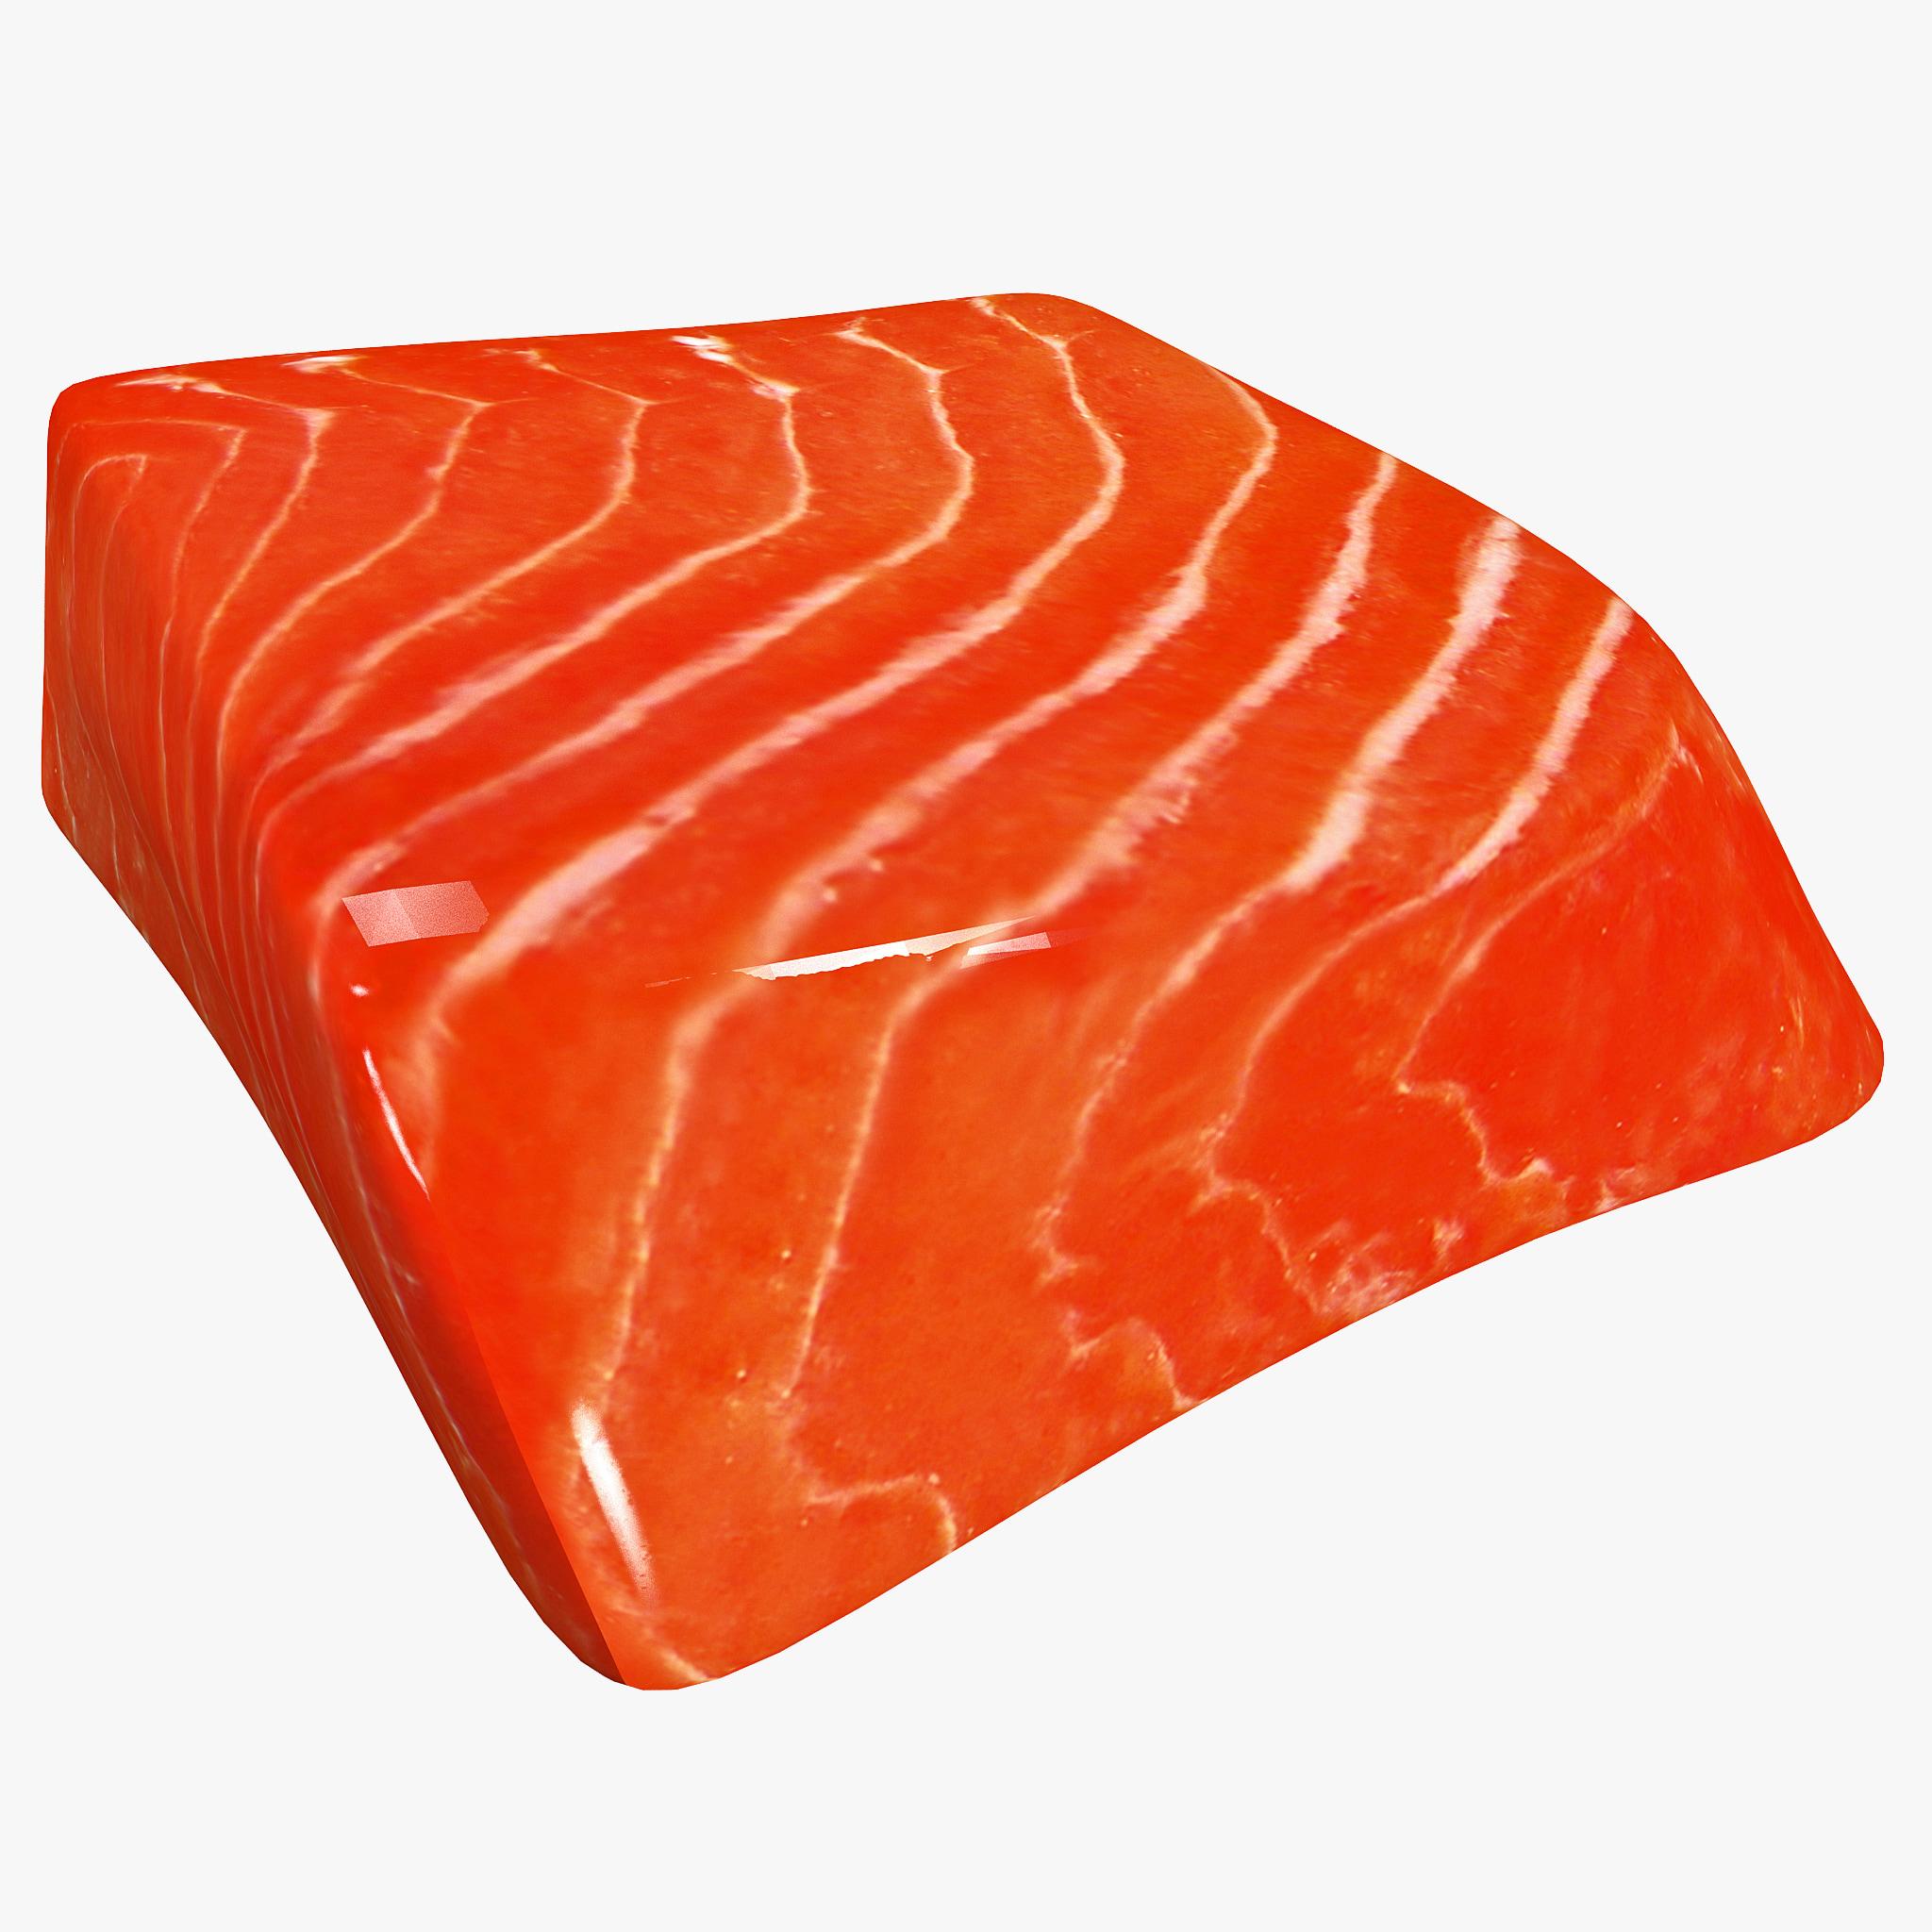 3d slab salmon steak